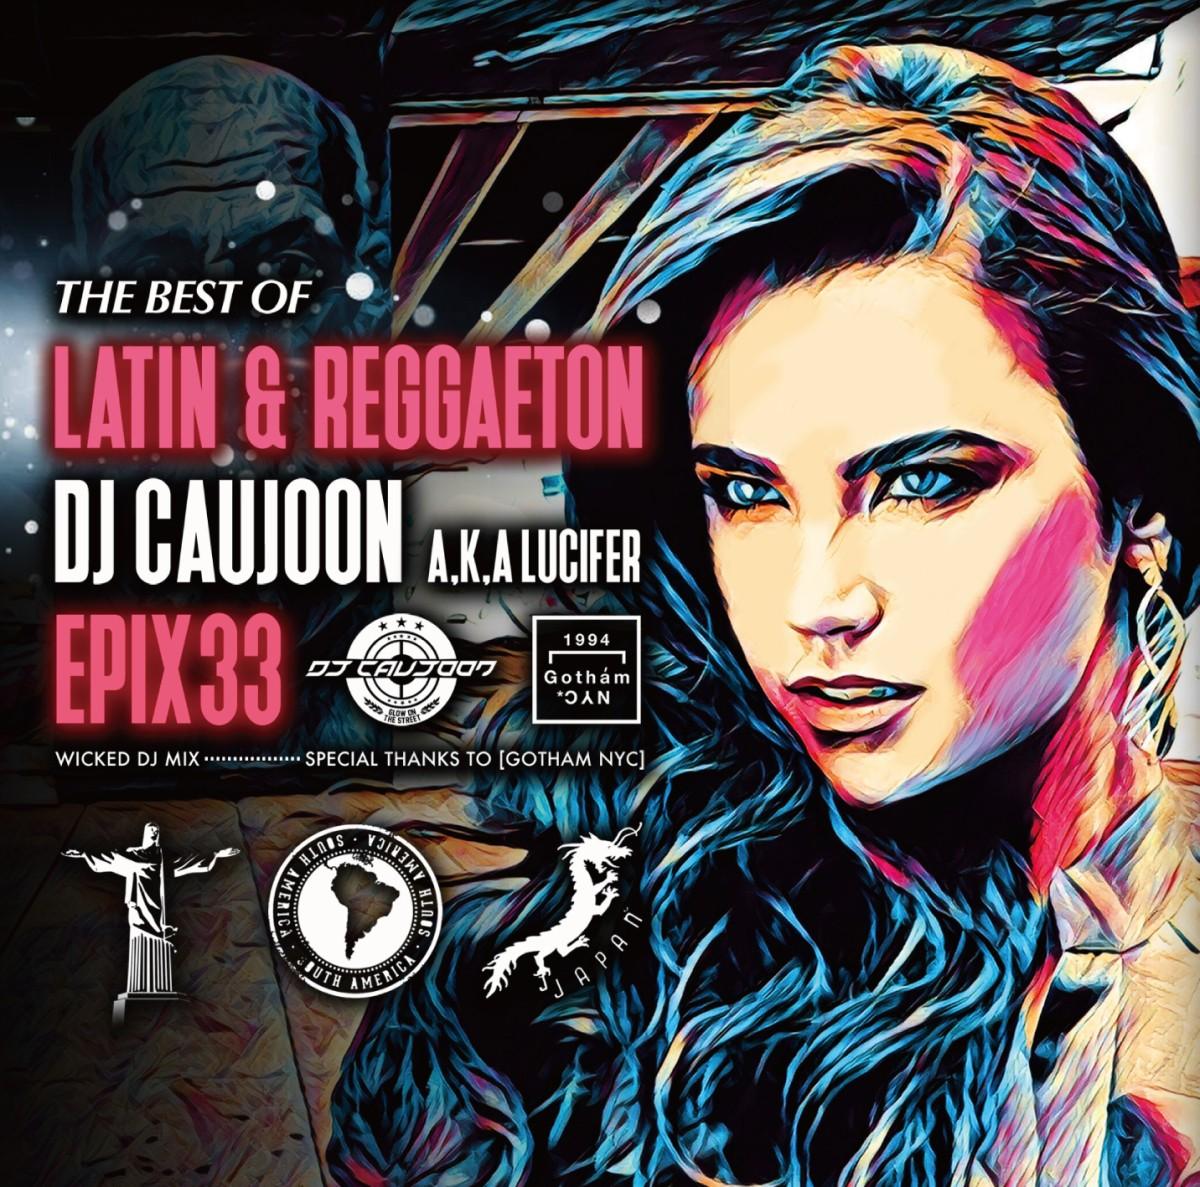 DJ Caujoon DJコージュン ラテン レゲトン アフロビート 夏Epix 33 -The Best Of Latin & Reggaeton- / DJ Caujoon